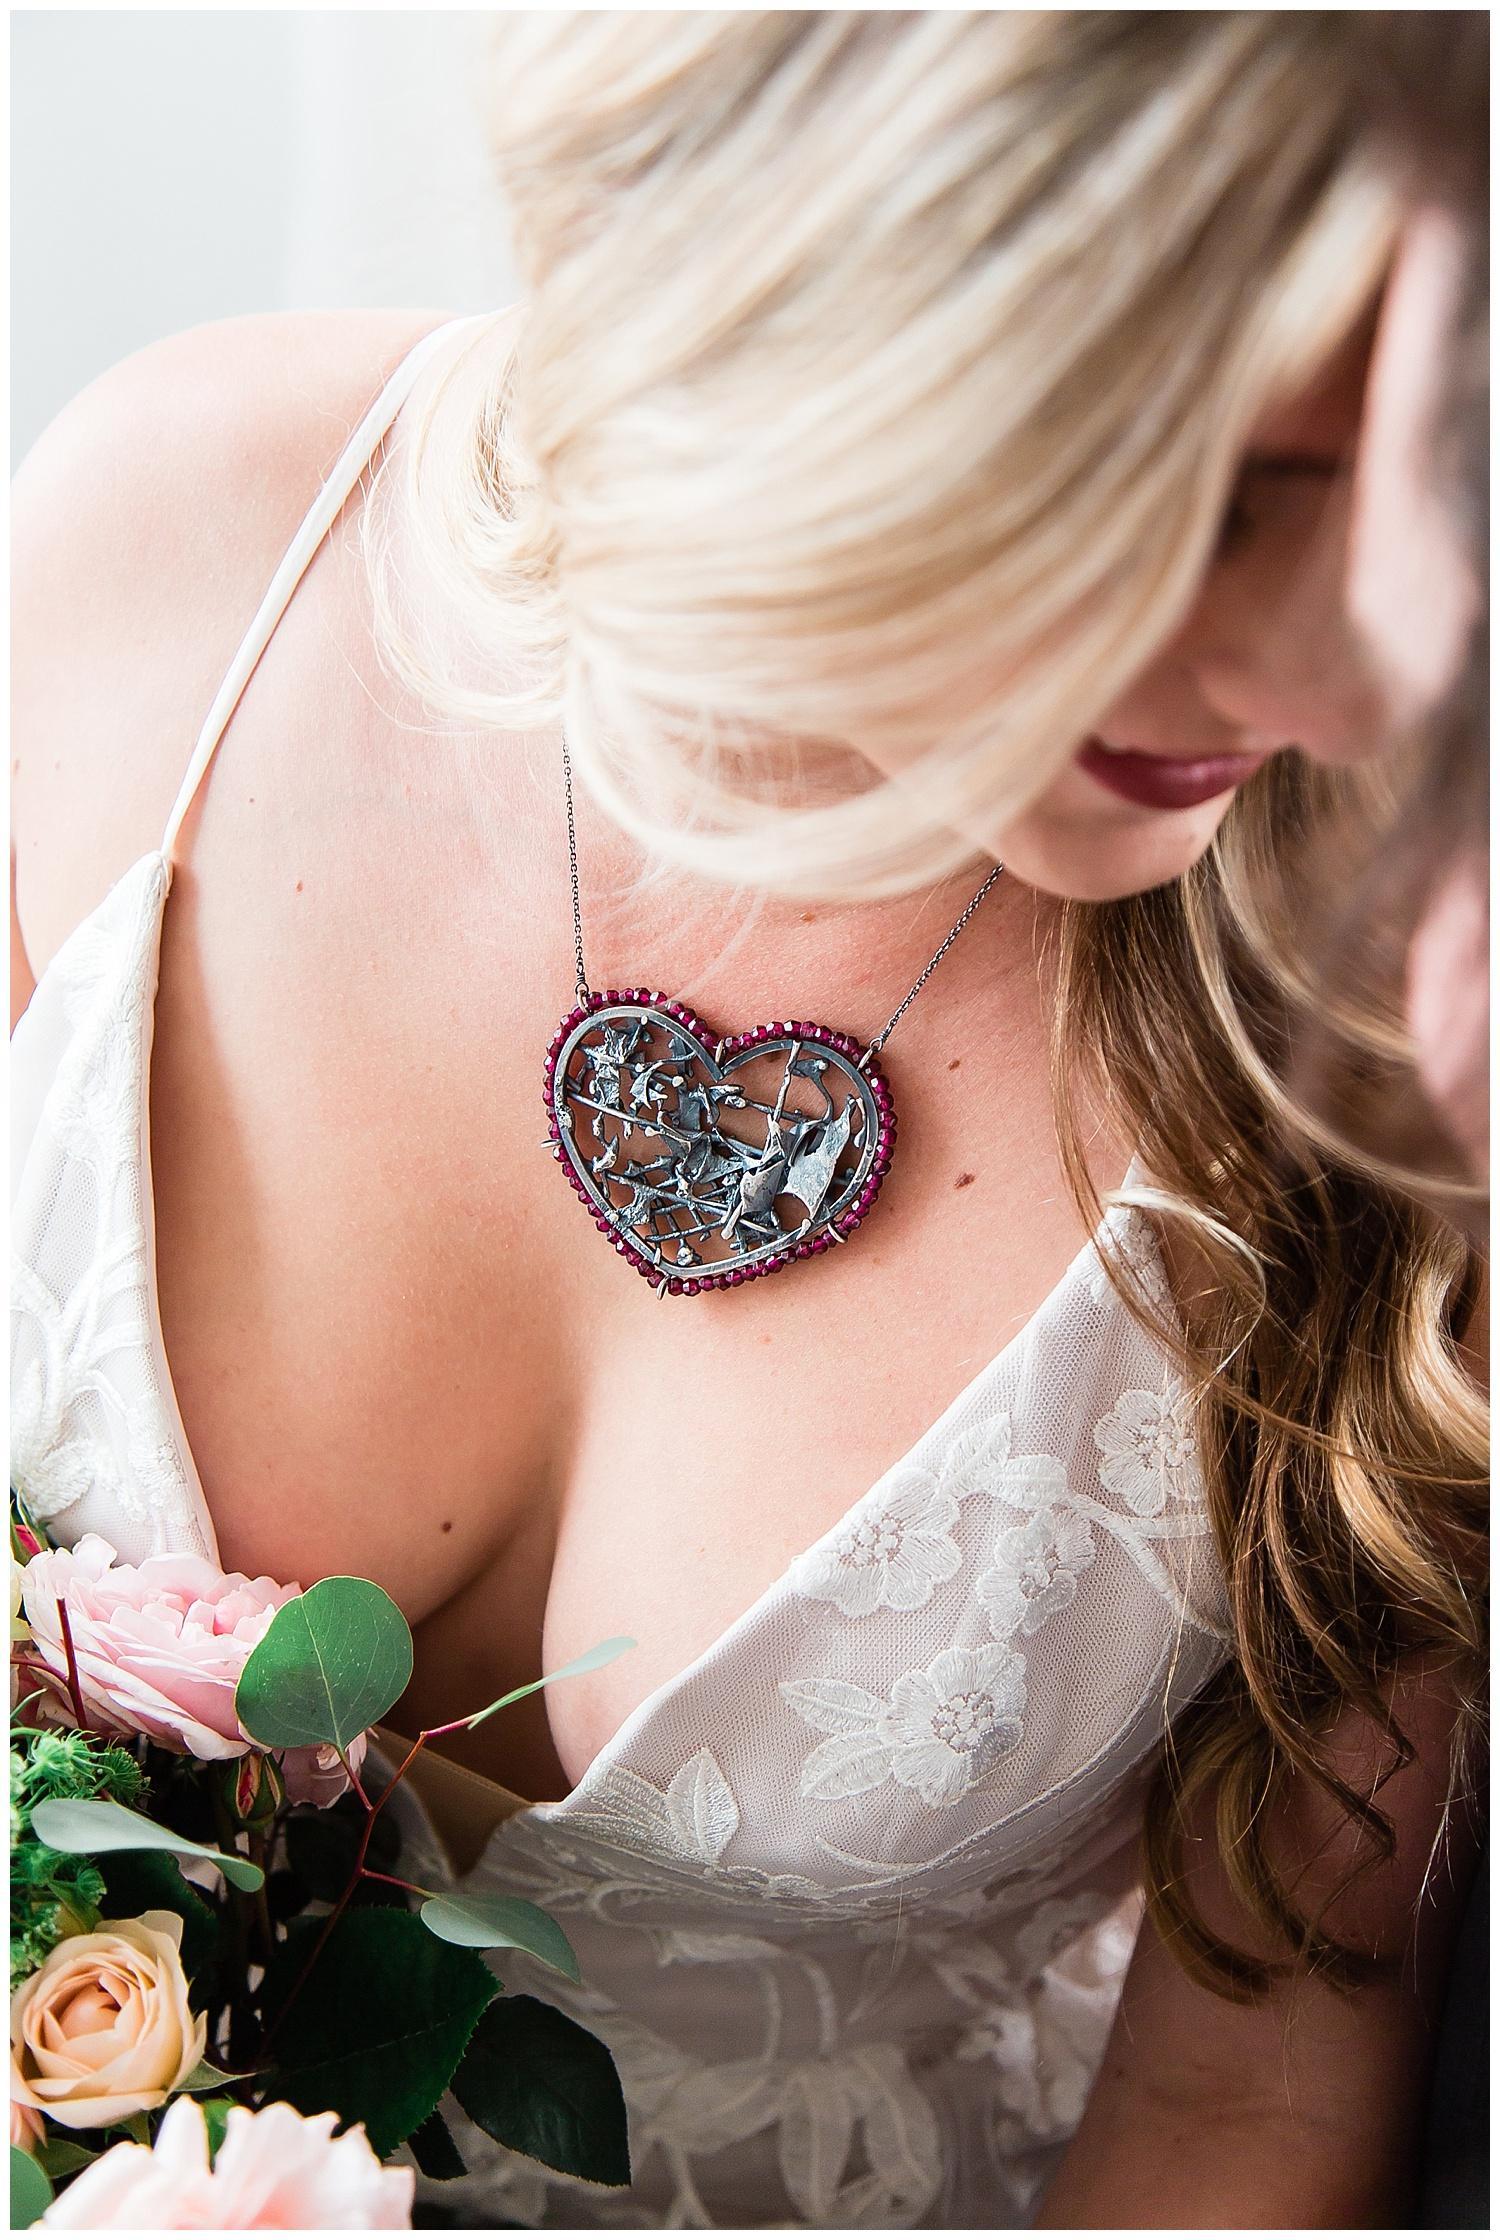 Kelley williams photography Erica freestone necklace